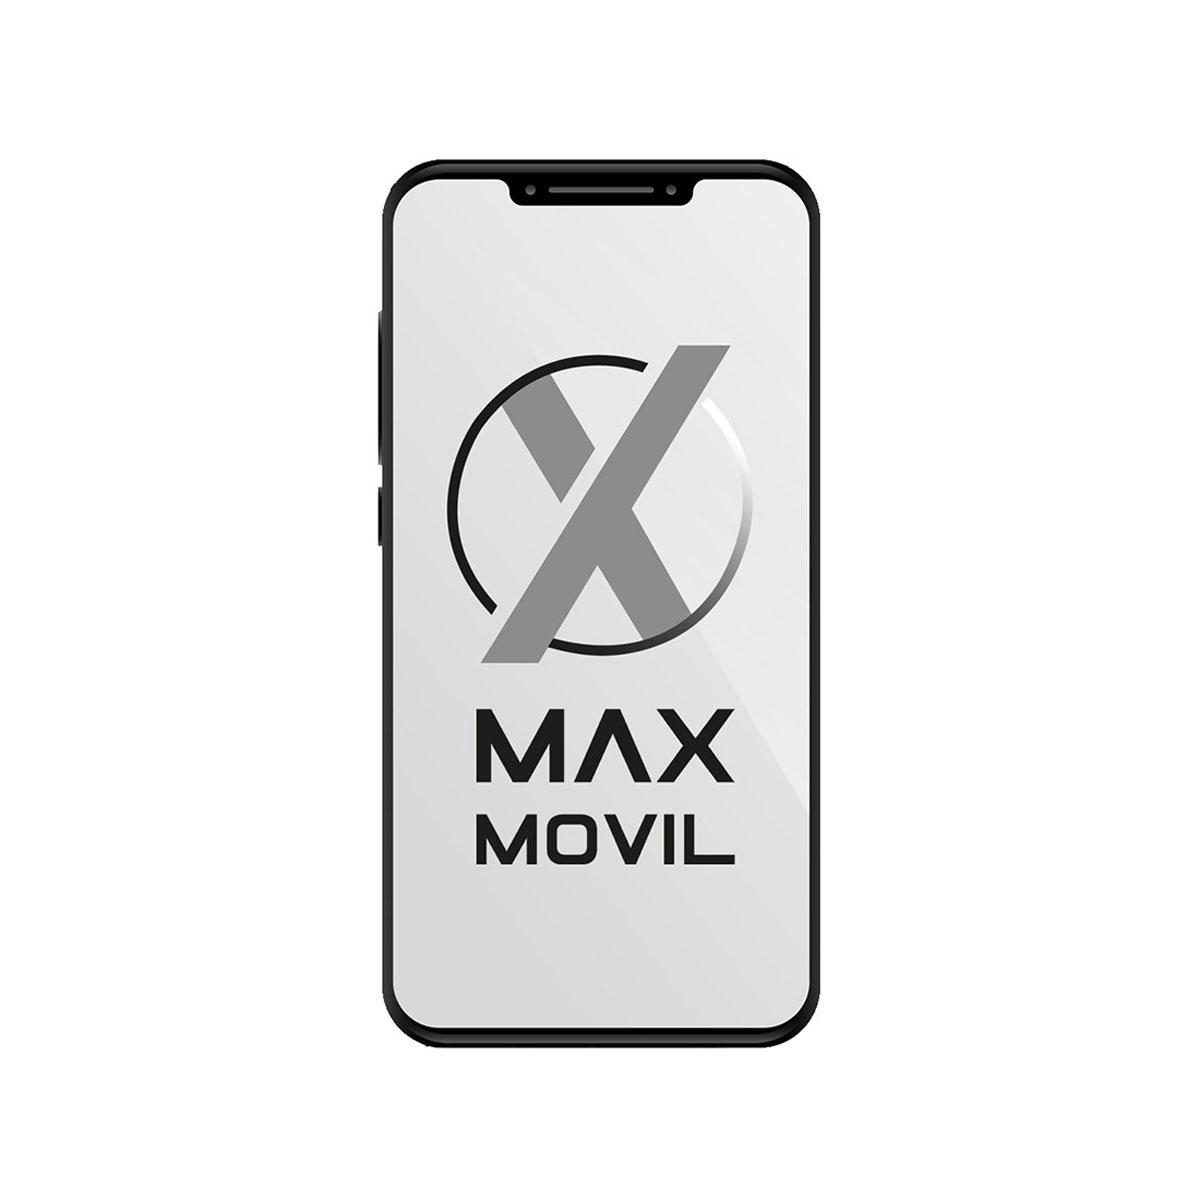 Apple iPhone SE (2020) 64GB Negro MX9R2QL/A